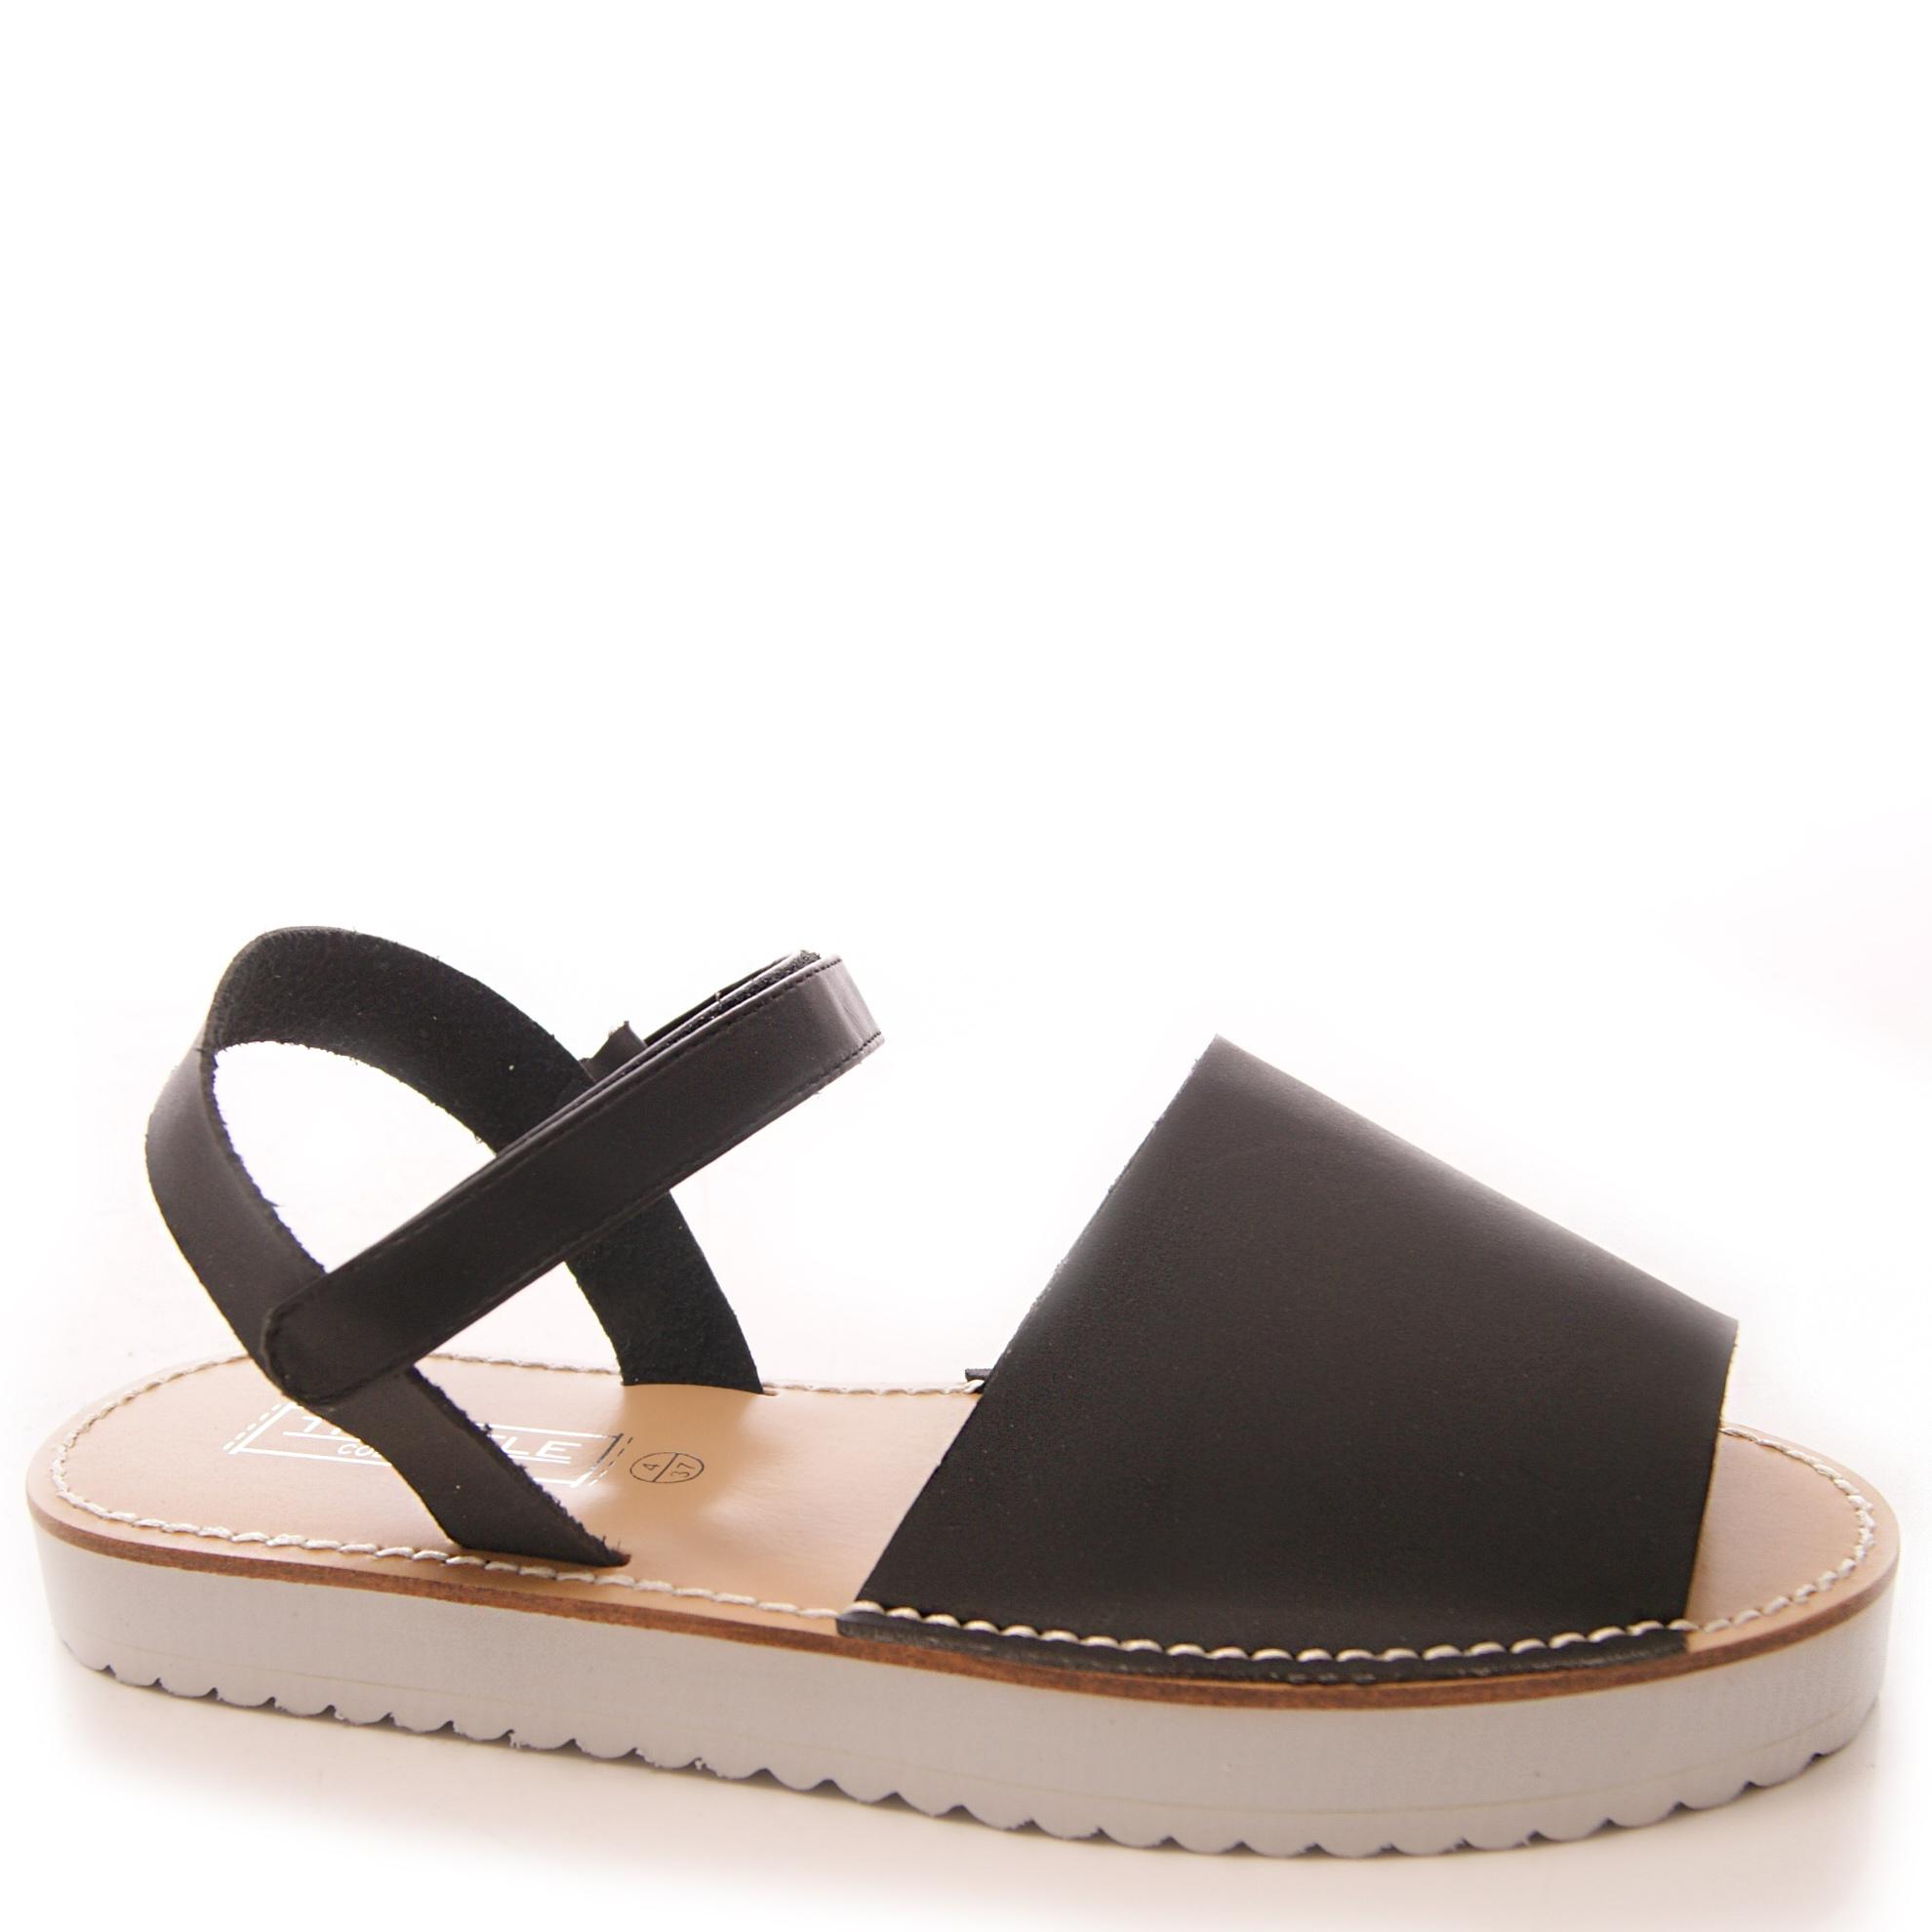 Find great deals on eBay for flat platform sandals. Shop with confidence.